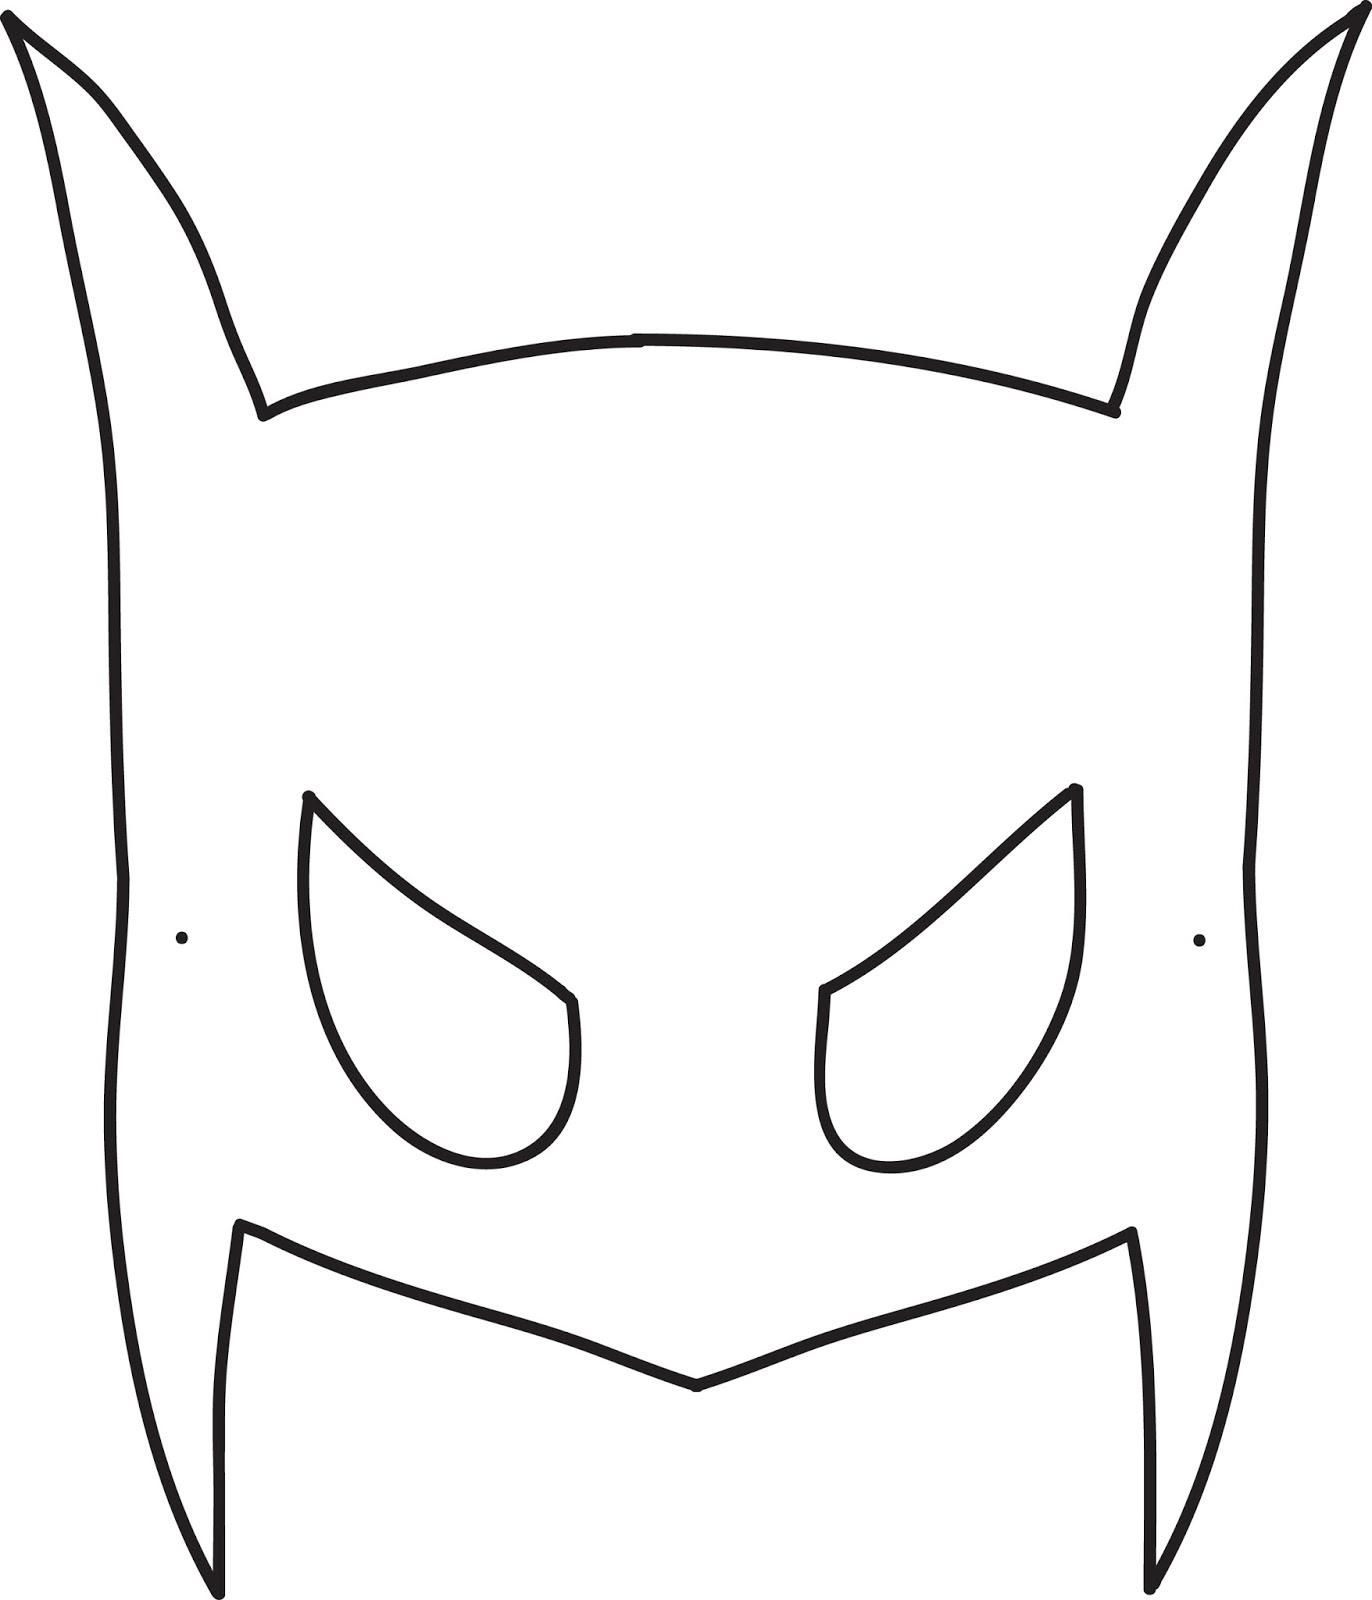 Sample Batman Mask Template